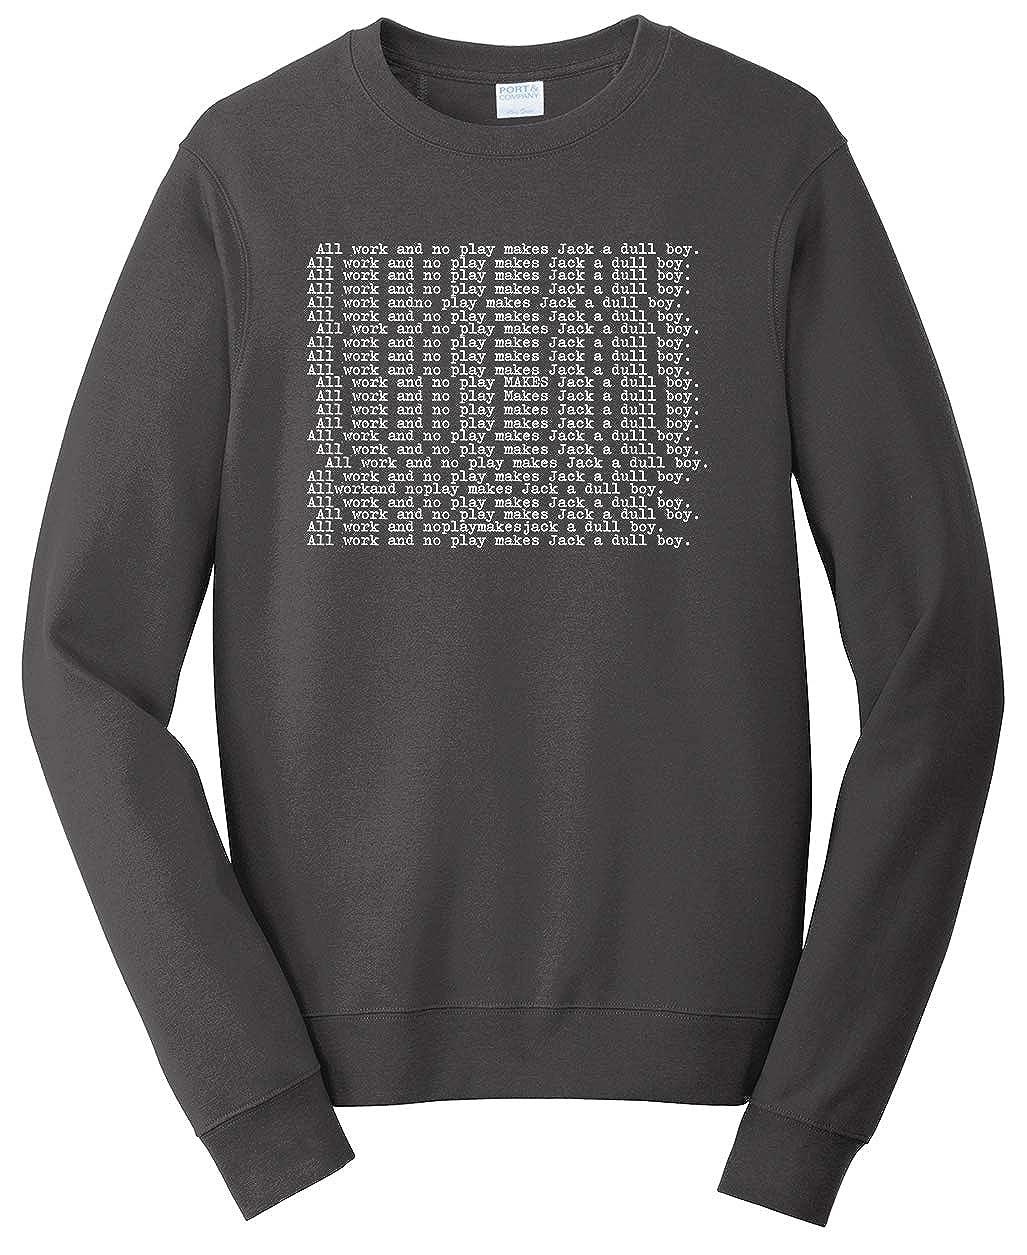 Tenacitee Unisex All Work No Play Makes Jack a Dull Boy Sweatshirt